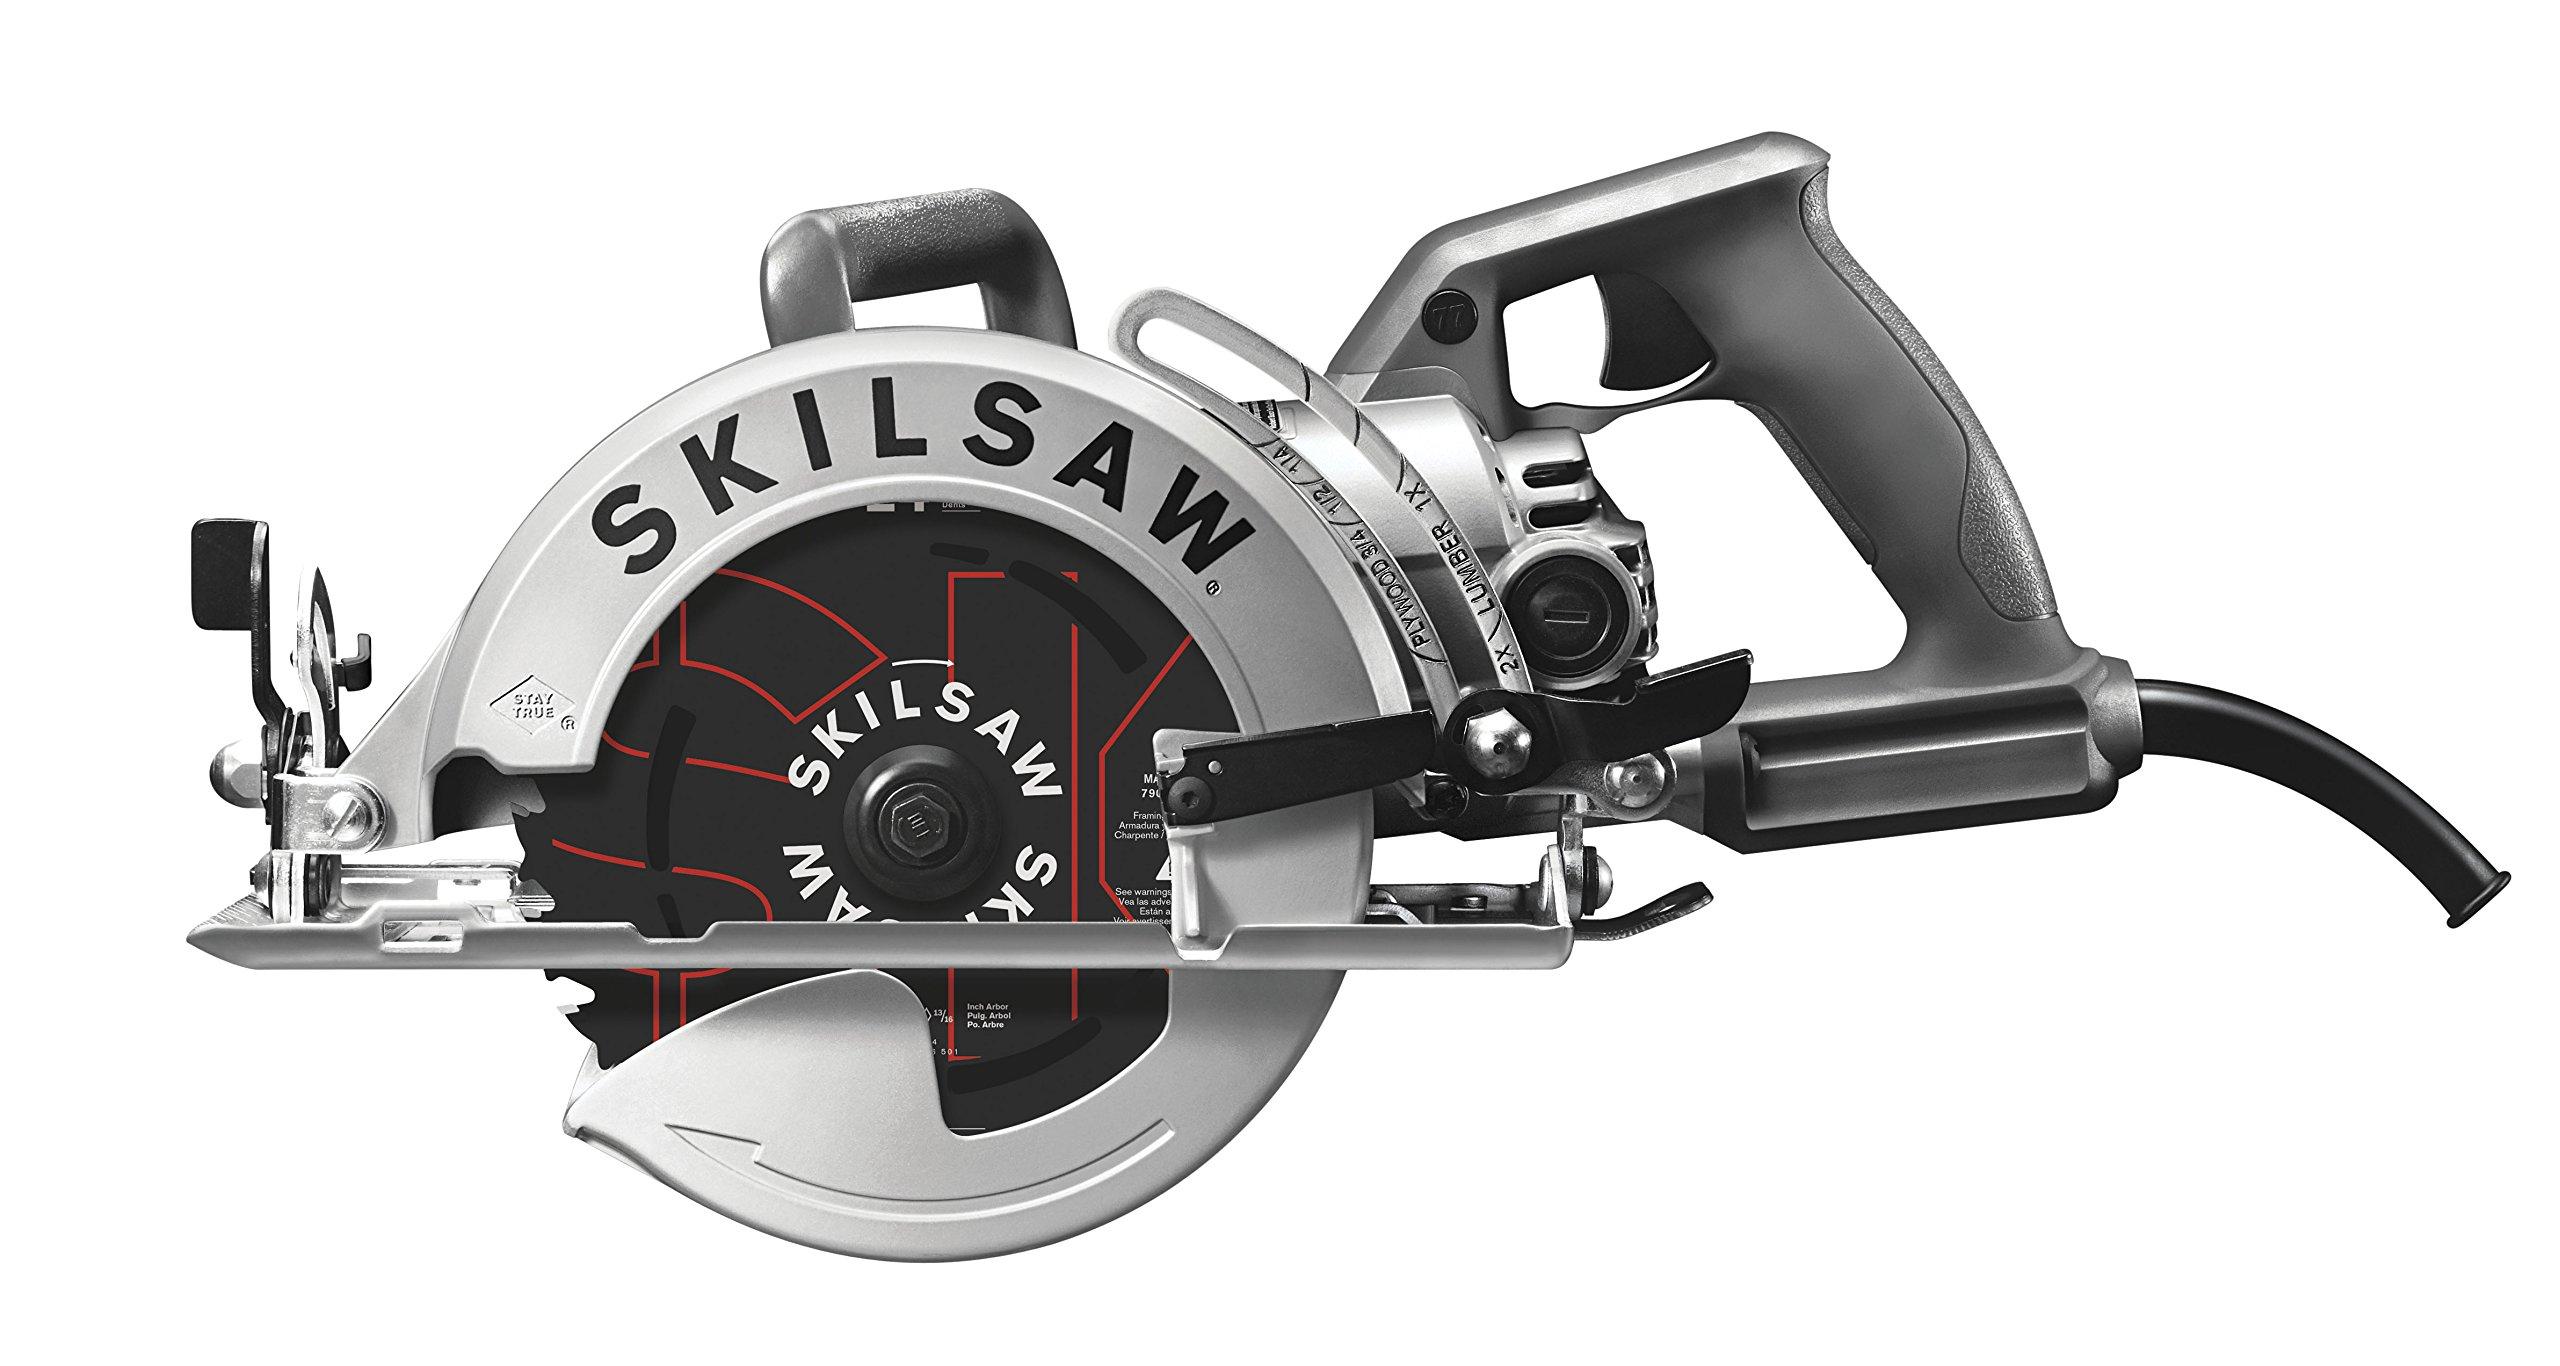 SKILSAW SPT77W-01 15-Amp 7-1/4-Inch Aluminum Worm Drive Circular Saw by SKILSAW